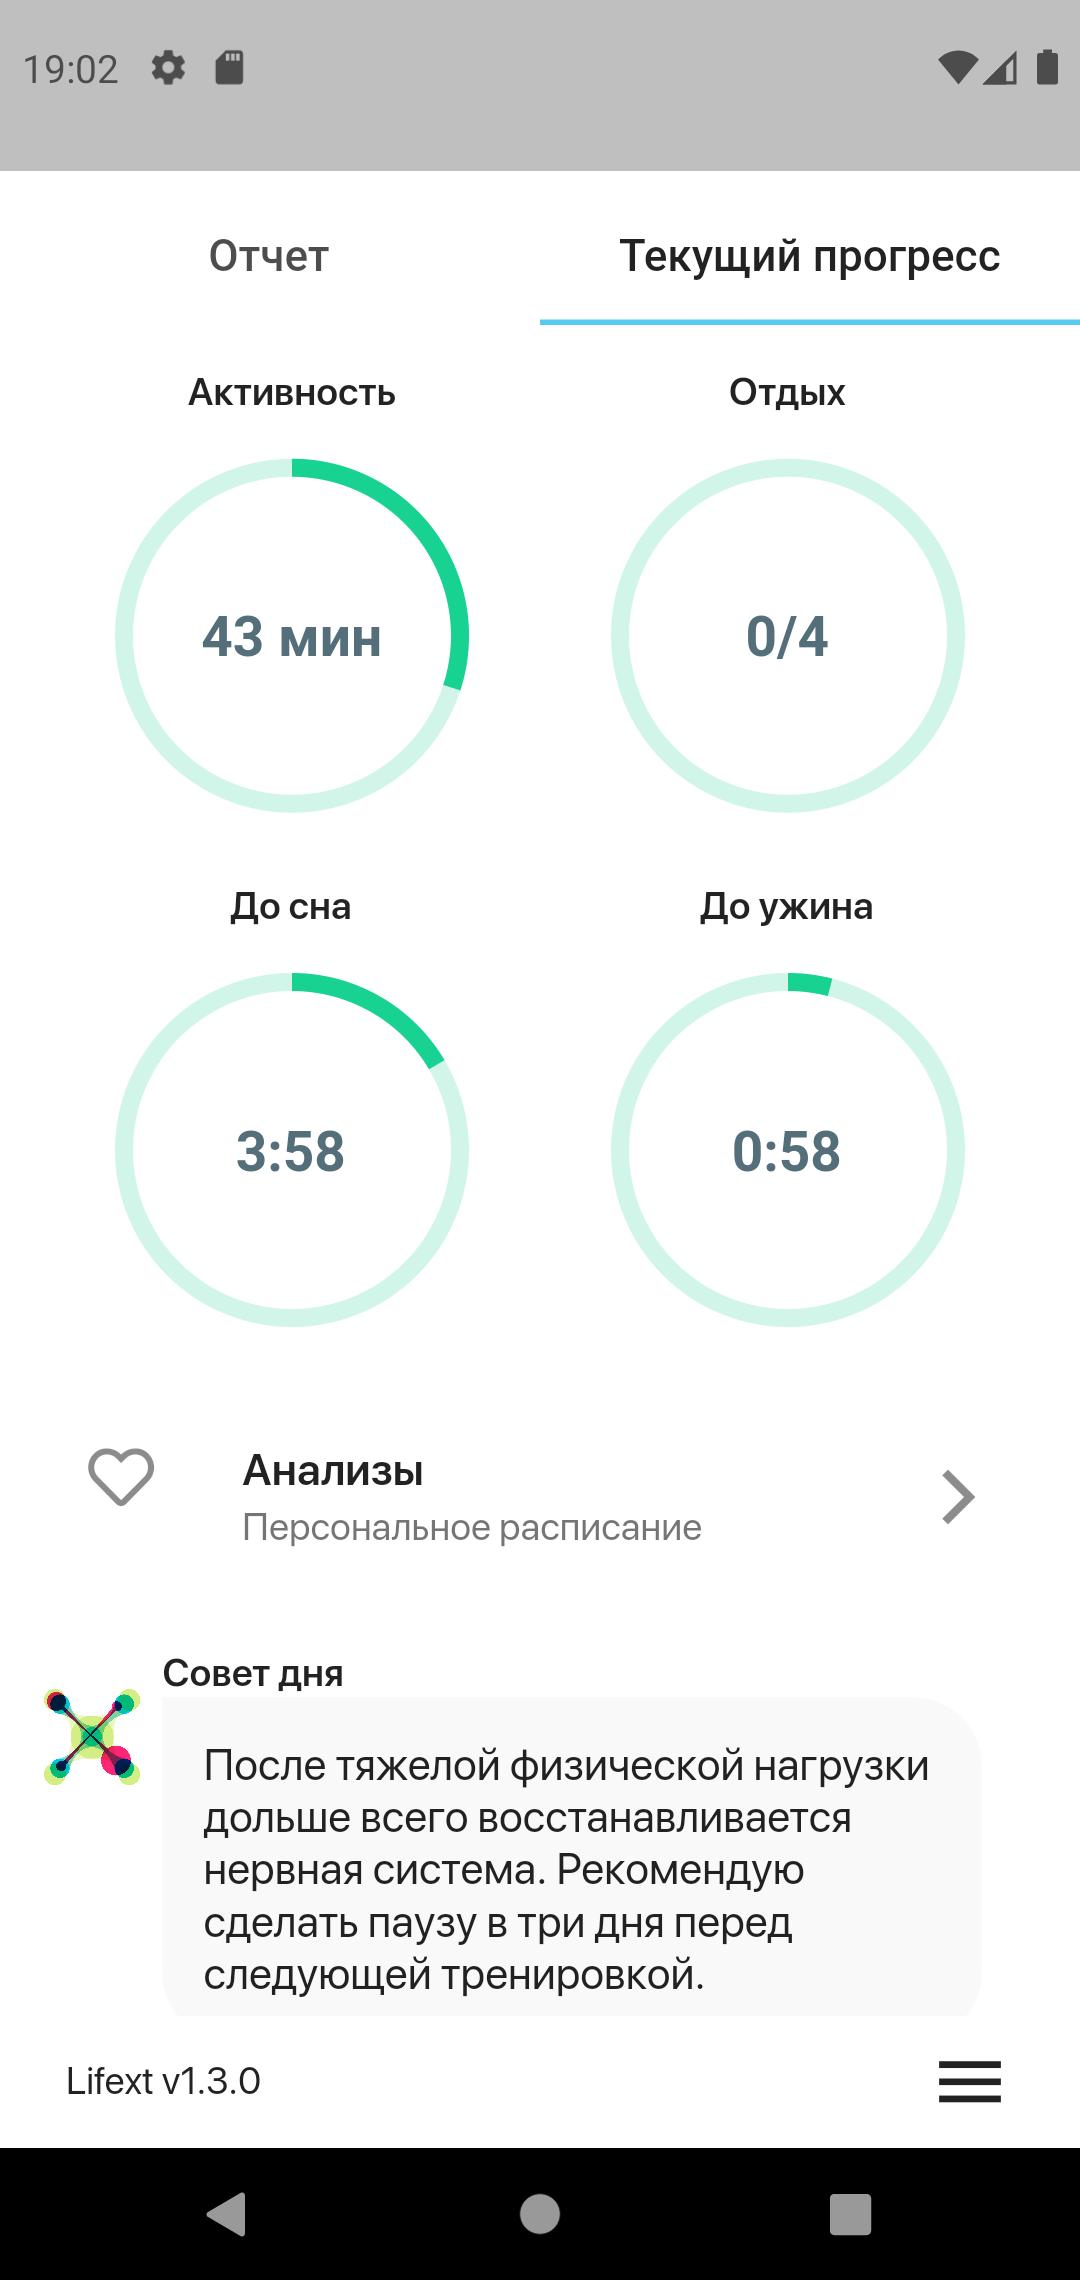 Screenshot 1604750561